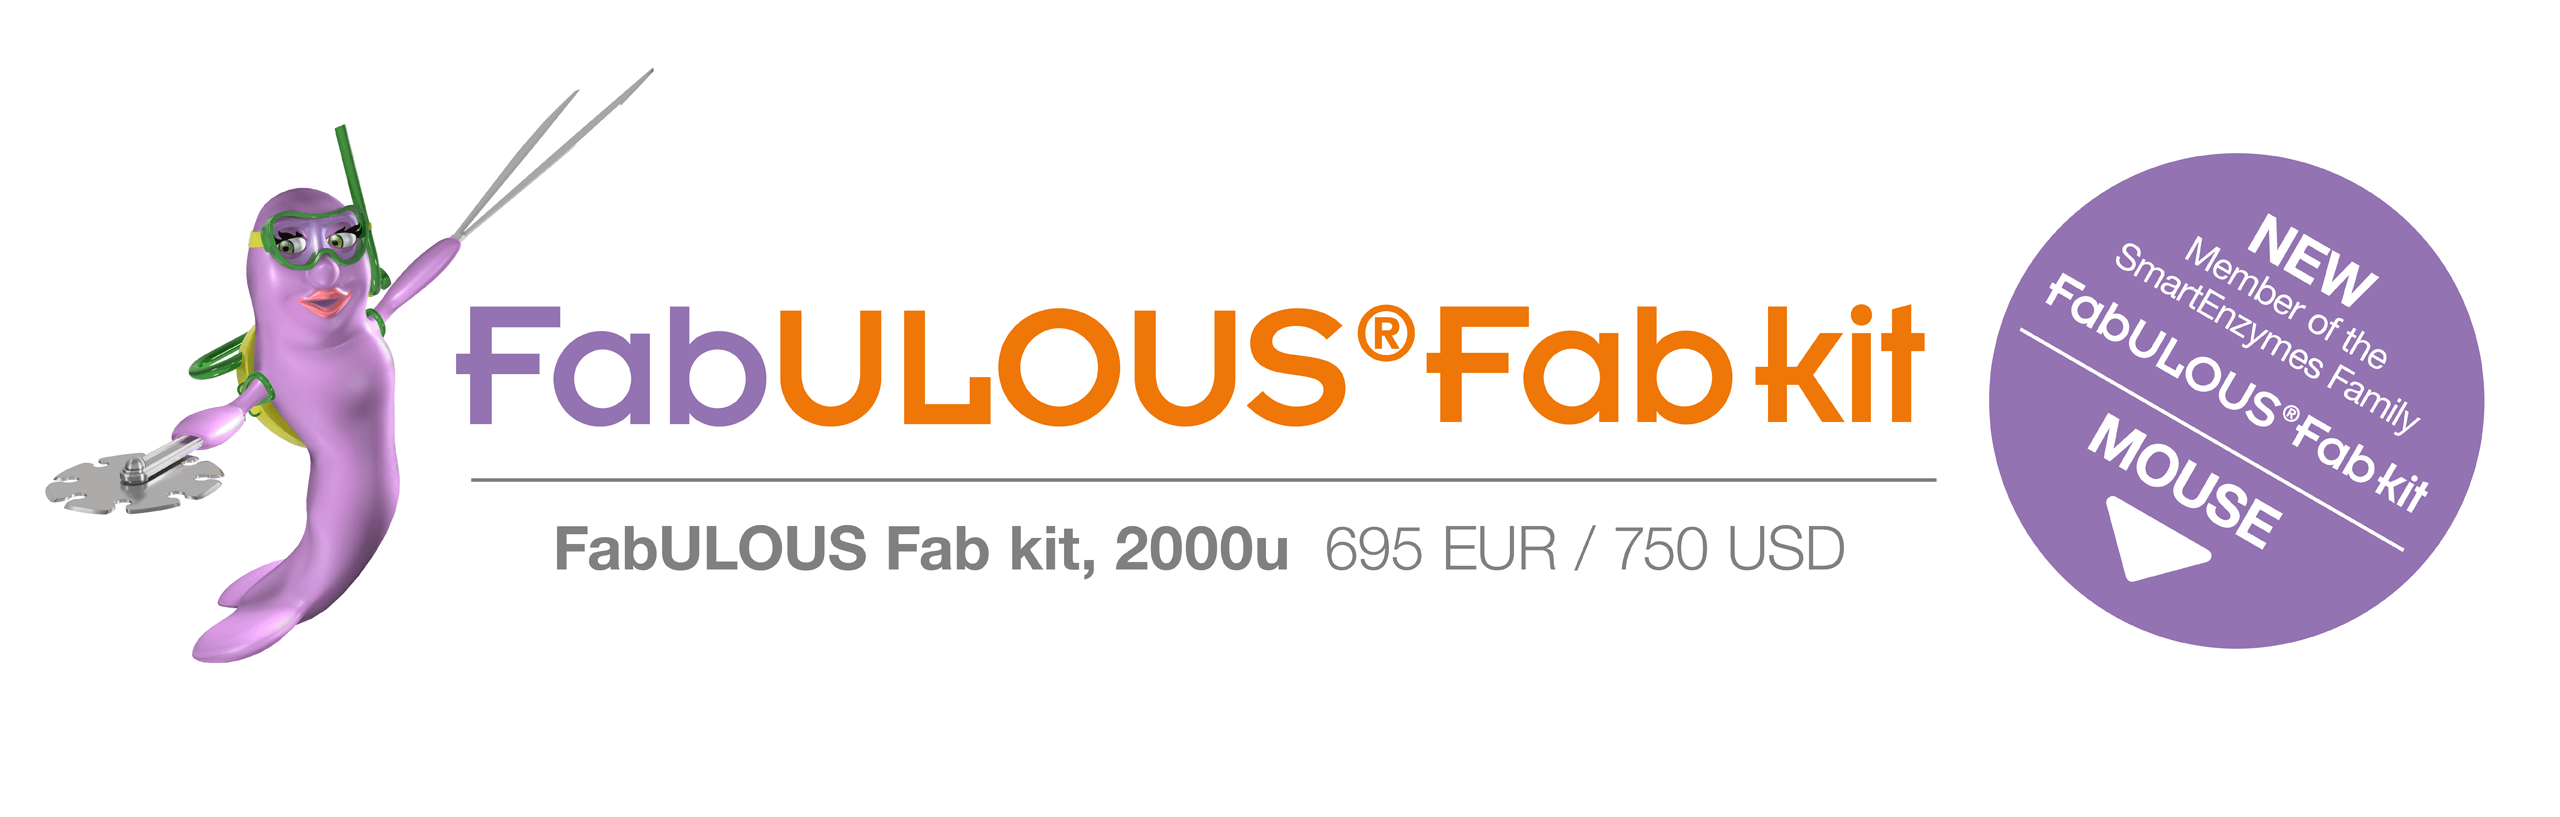 fabulous-fabkit-banner-2560x817